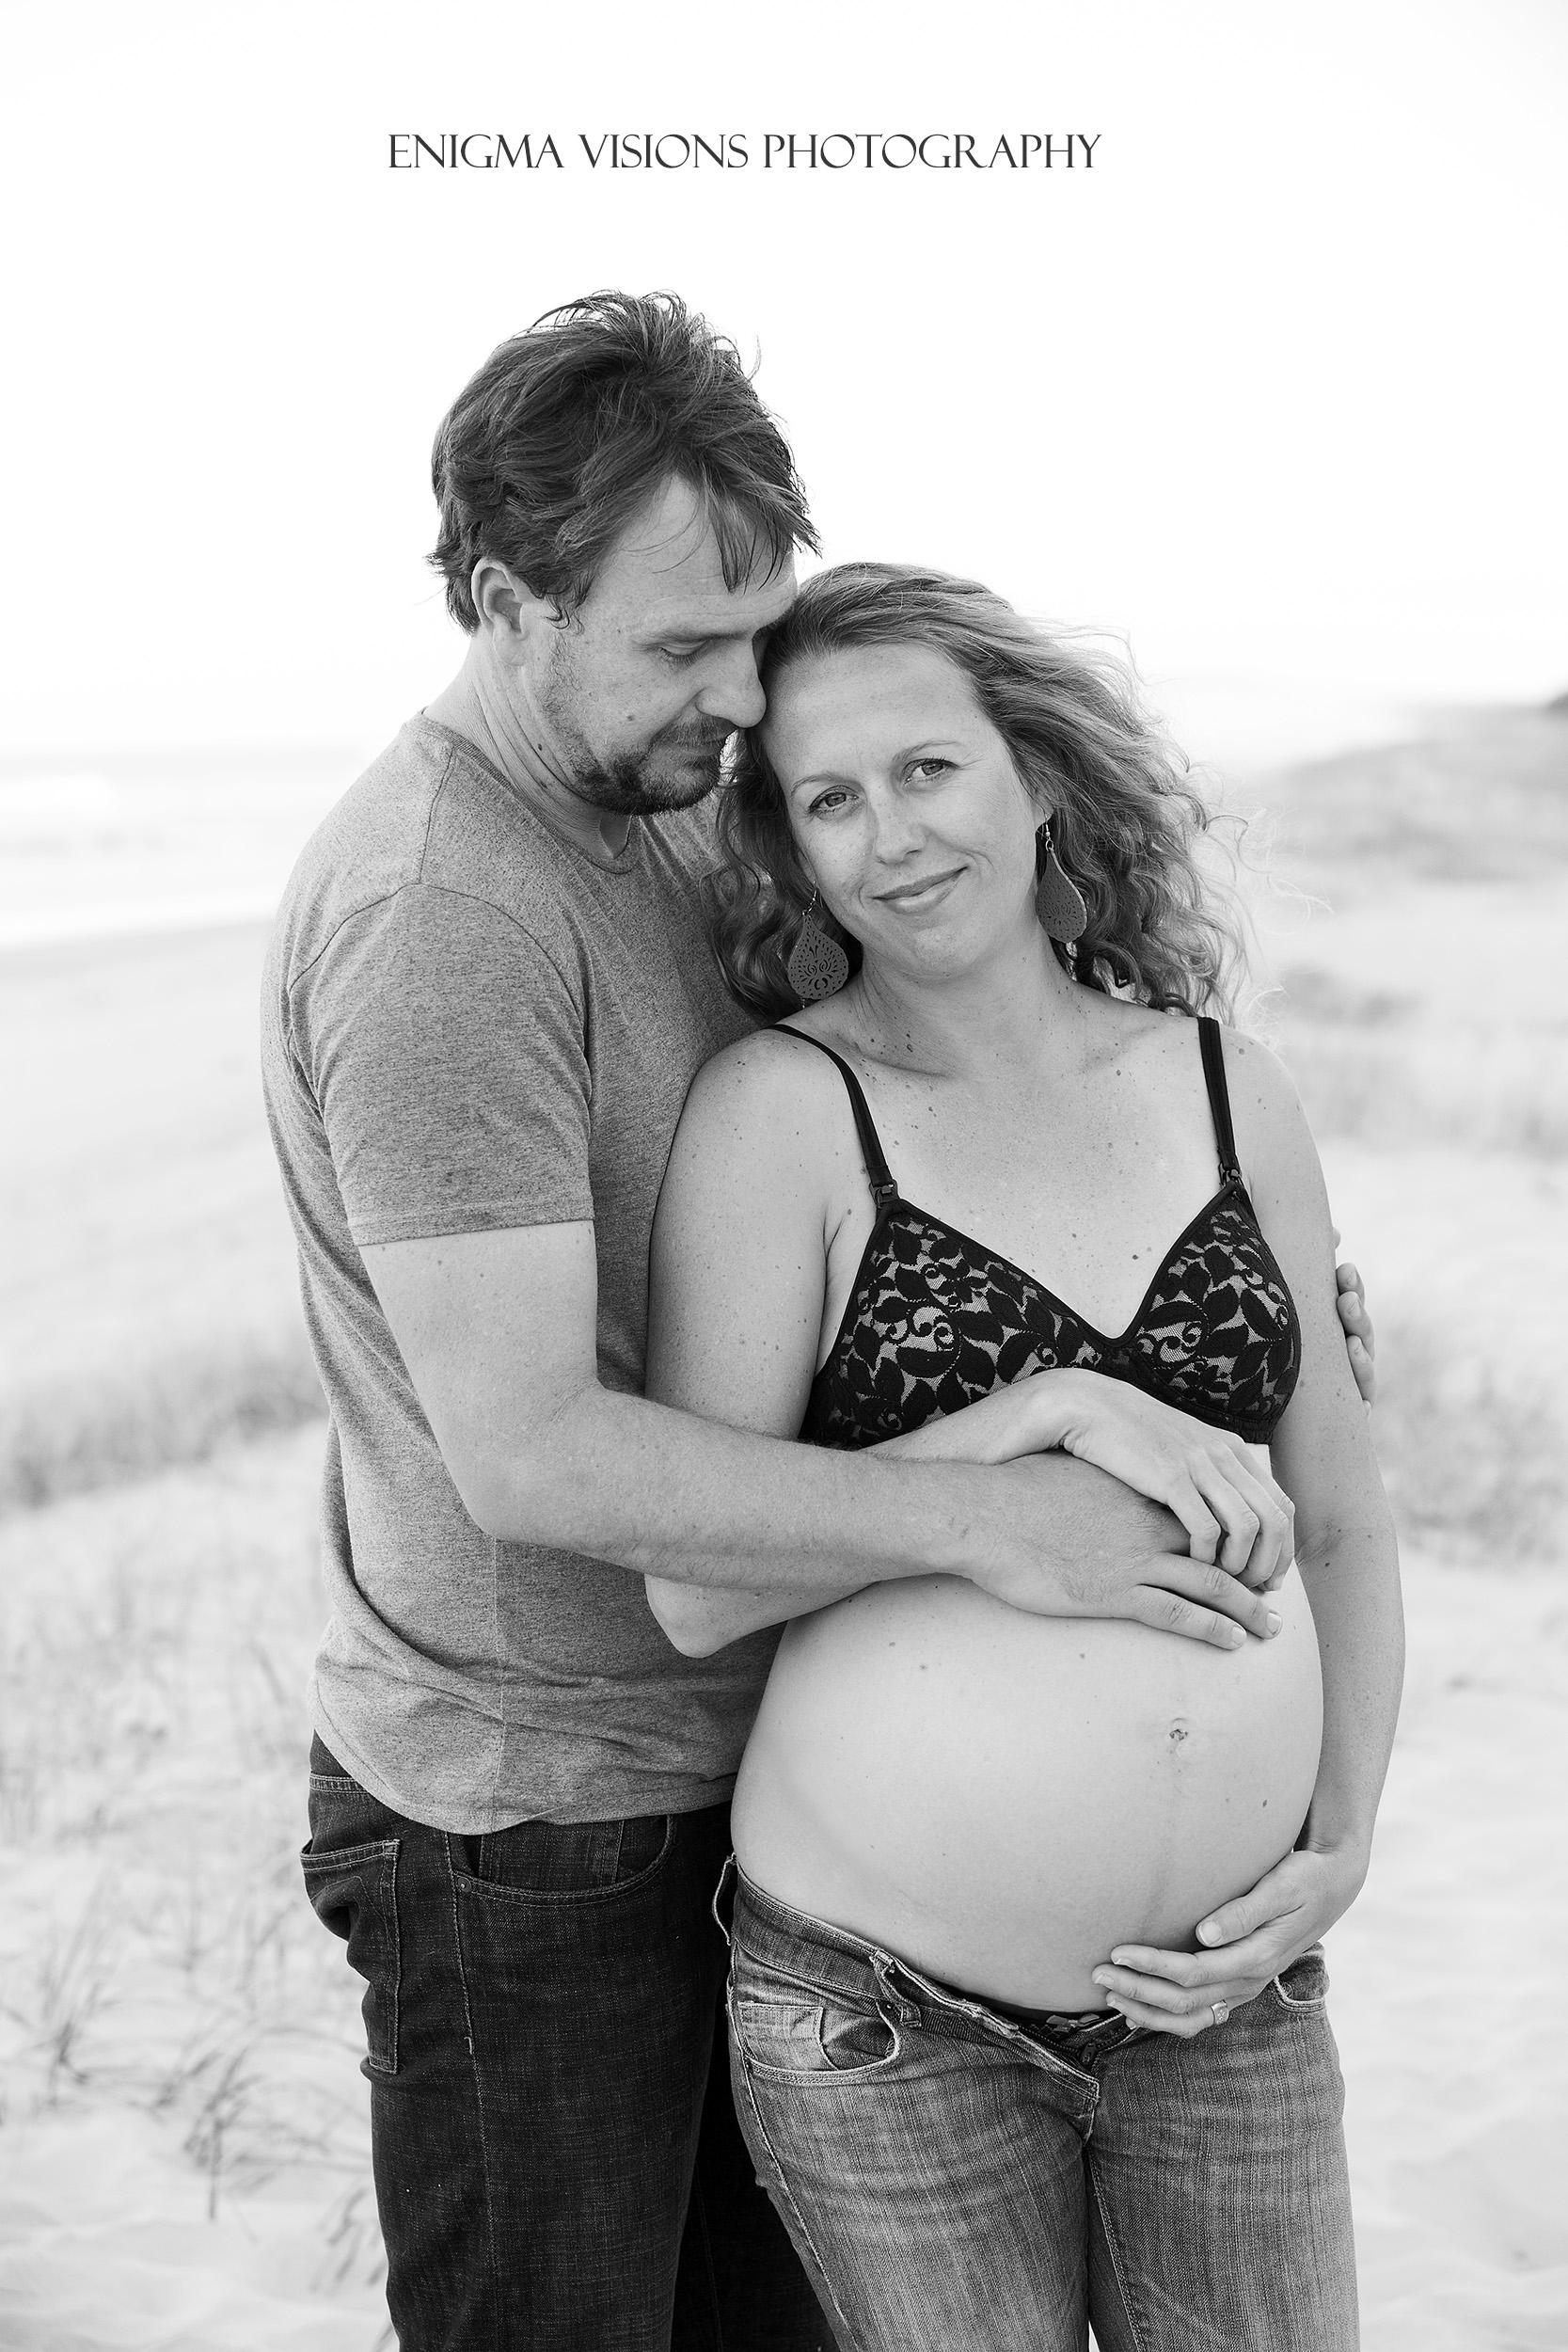 enigma_visions_photography_maternity_melandandrew_kingscliff (35).jpg